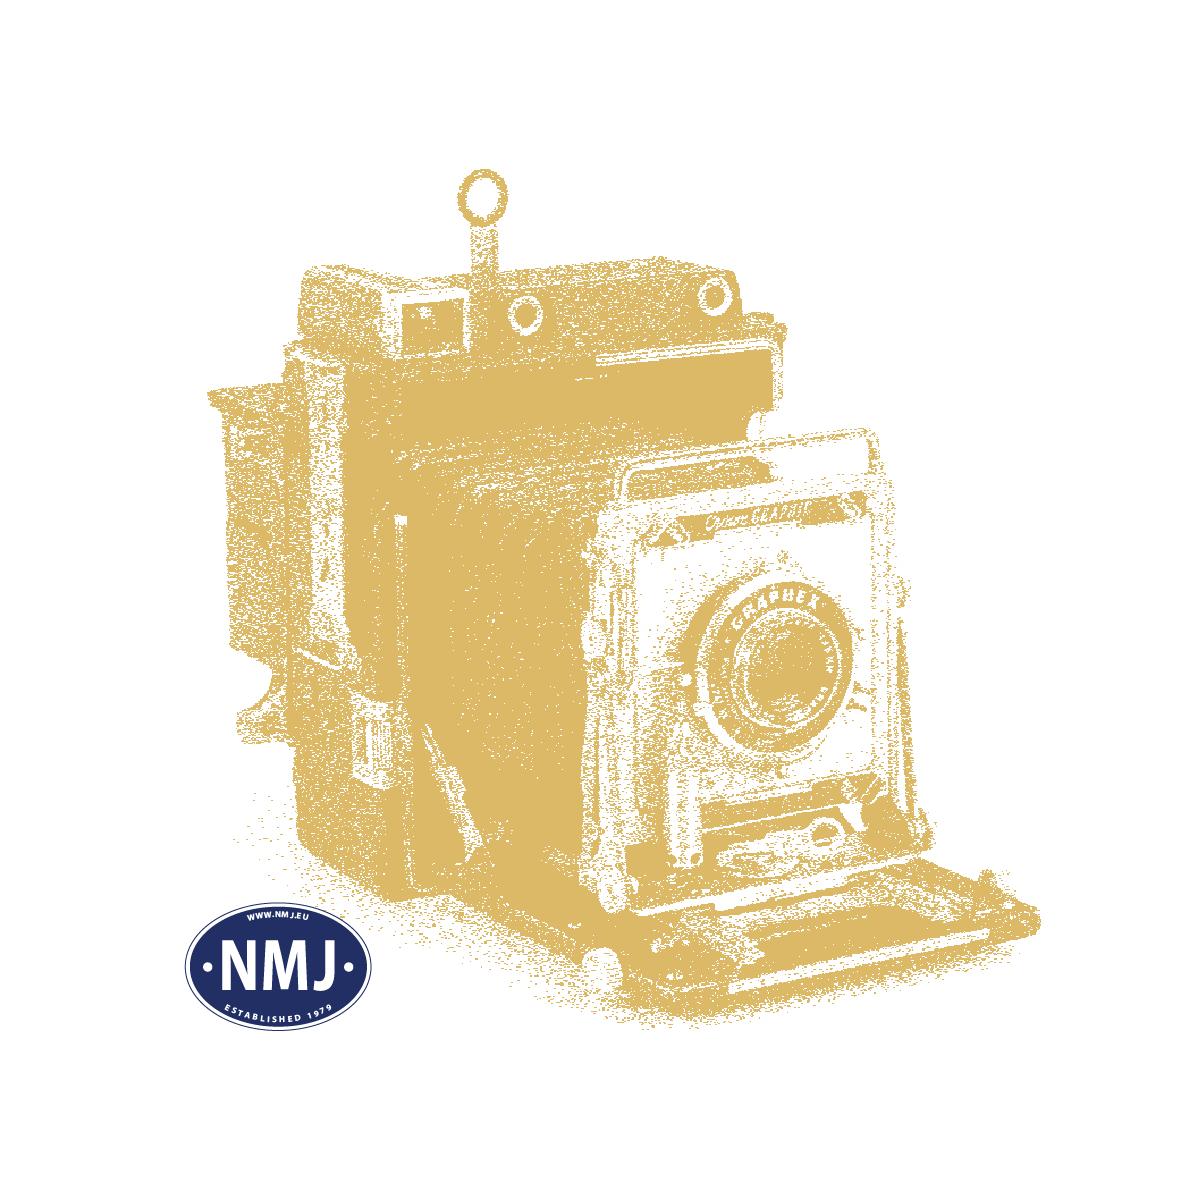 NMJT9908 - Pantograf für NMJ Topline EL13, Neuer Type, 2 stk (1 Par)